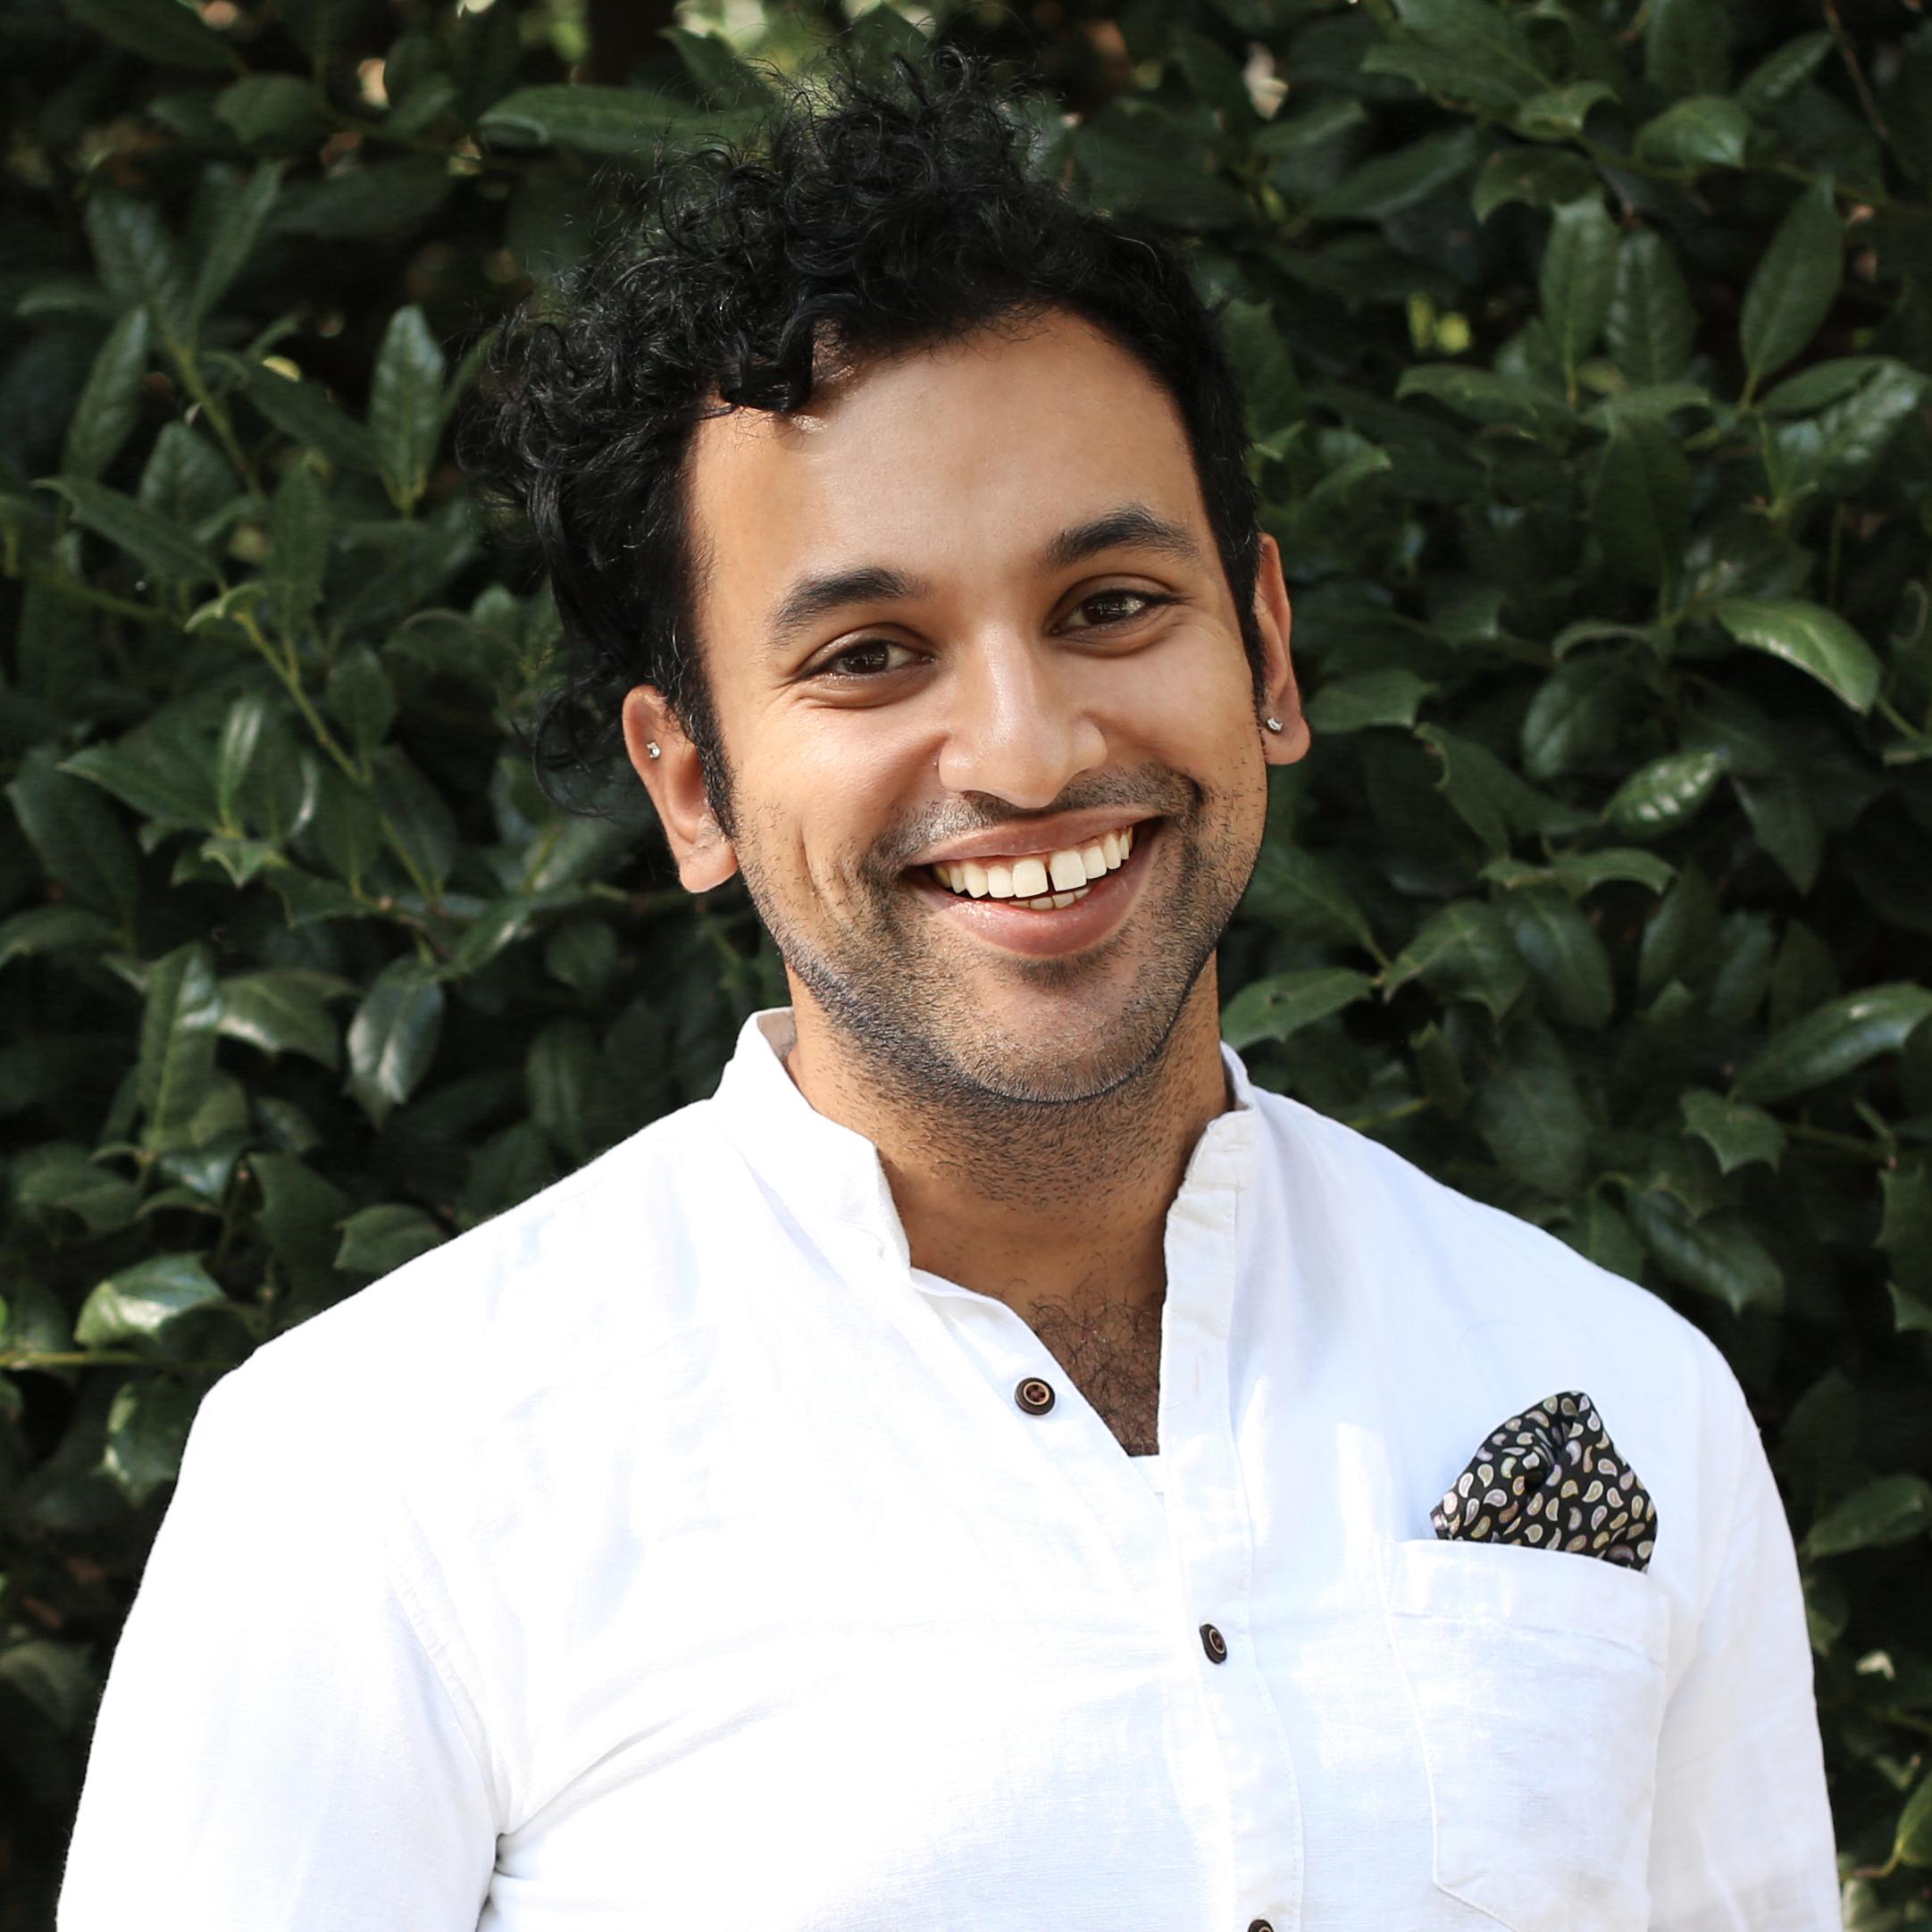 Vinay Kumar Mysore